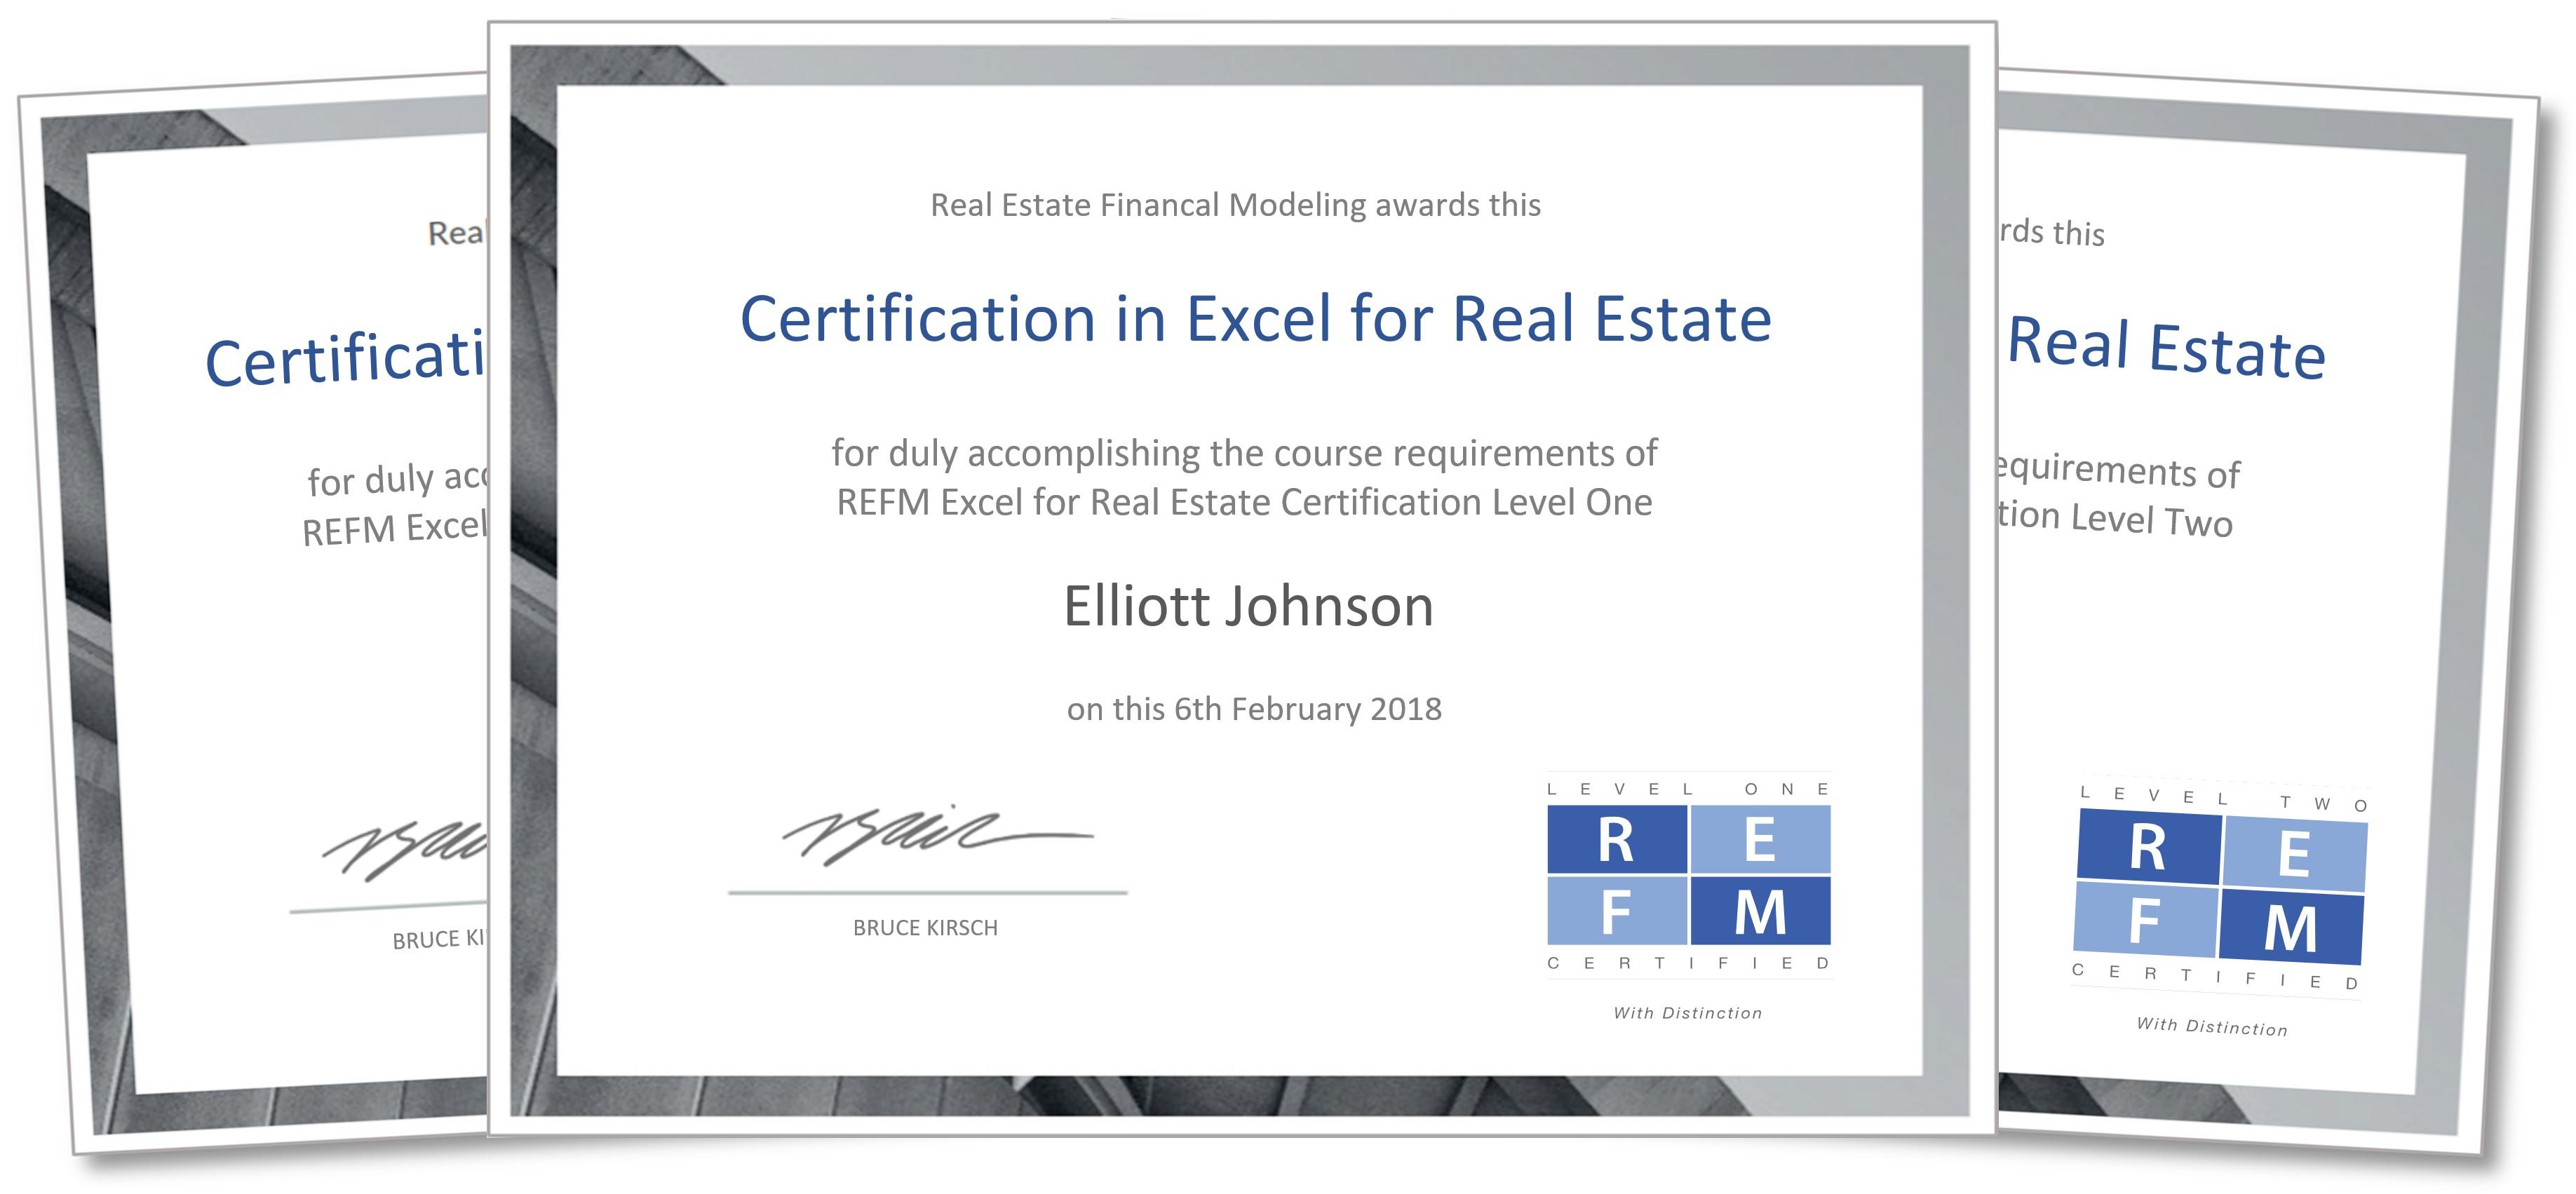 Excel Spreadsheet Certification For Refm Certification Program In Excel For Real Estate  Real Estate